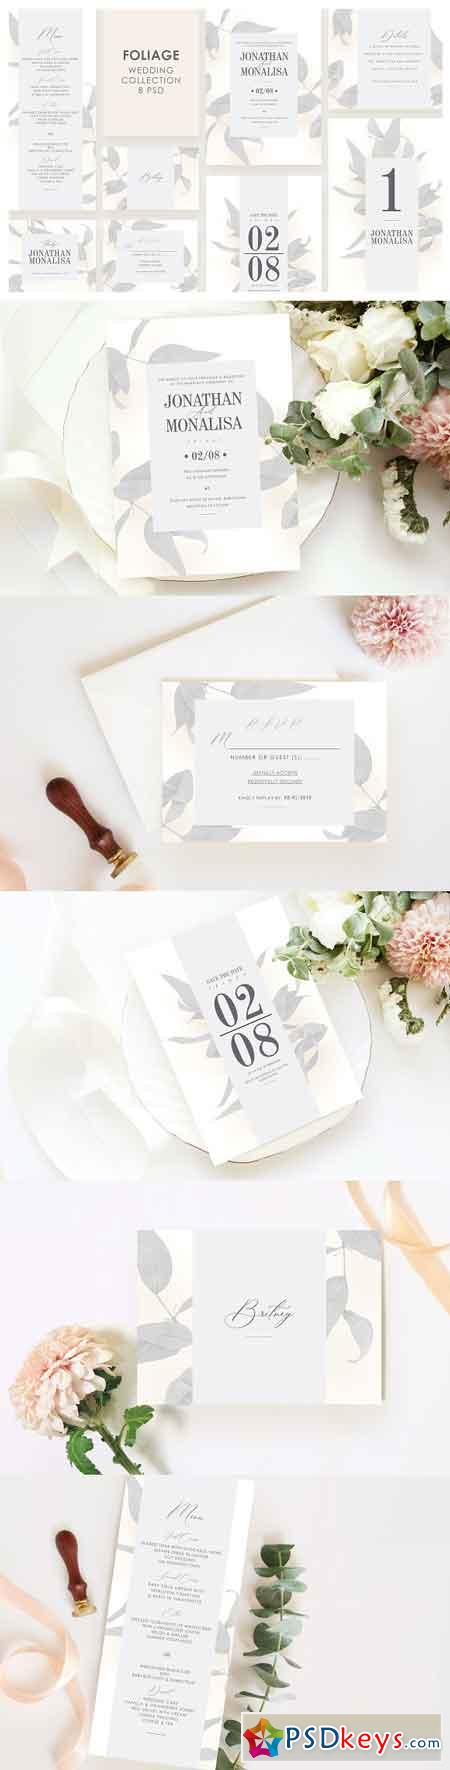 Foliage Wedding Invitation Set 3306906